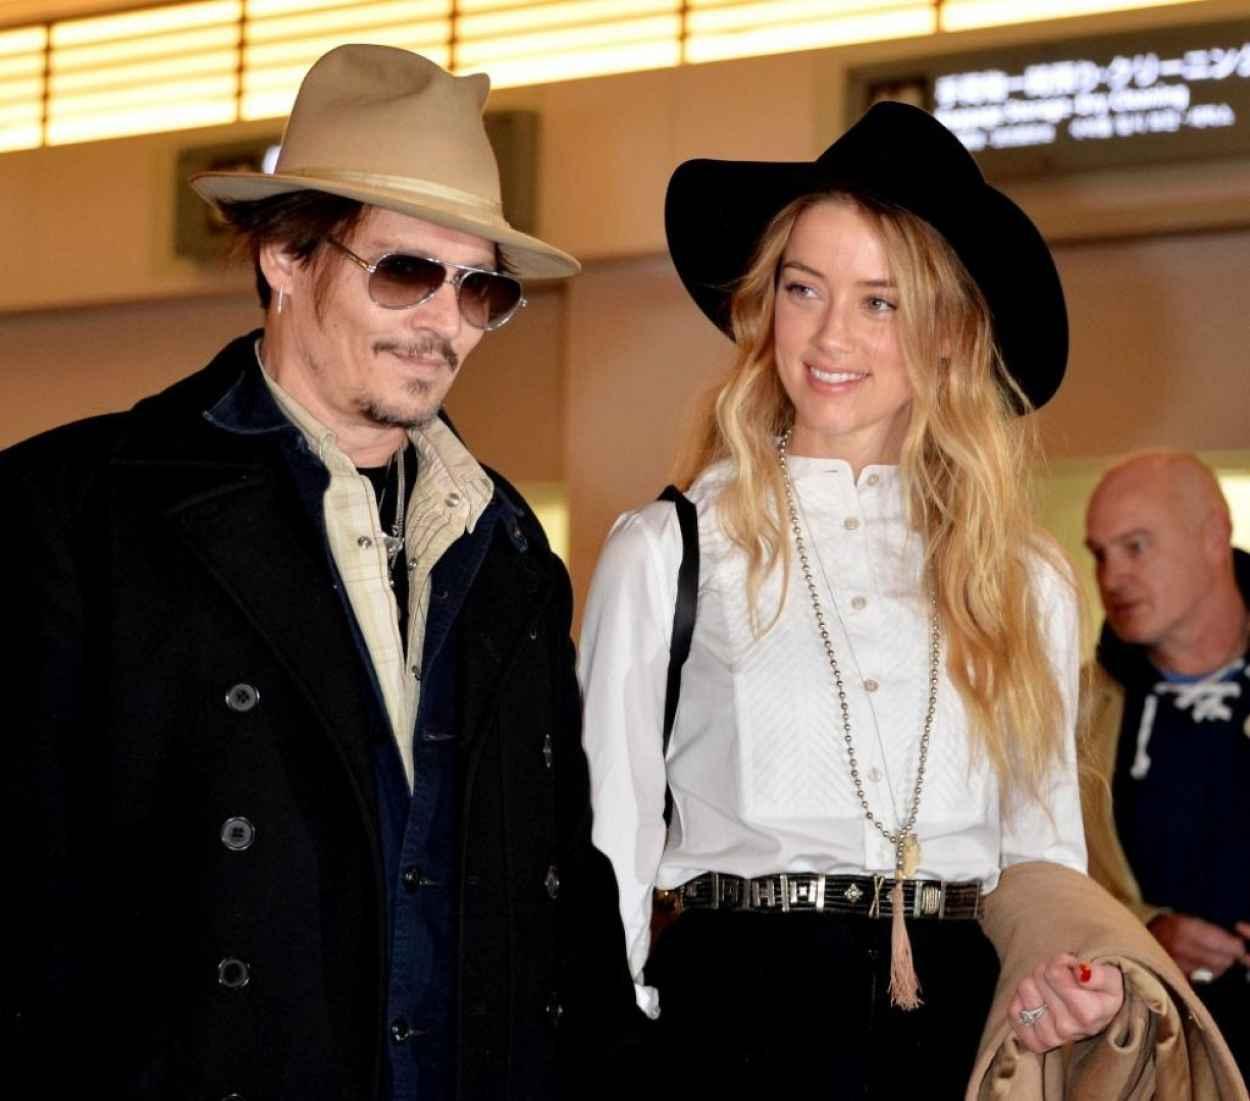 Amber Heard and Johnny Depp at Tokyo International Airport, January 2015-1